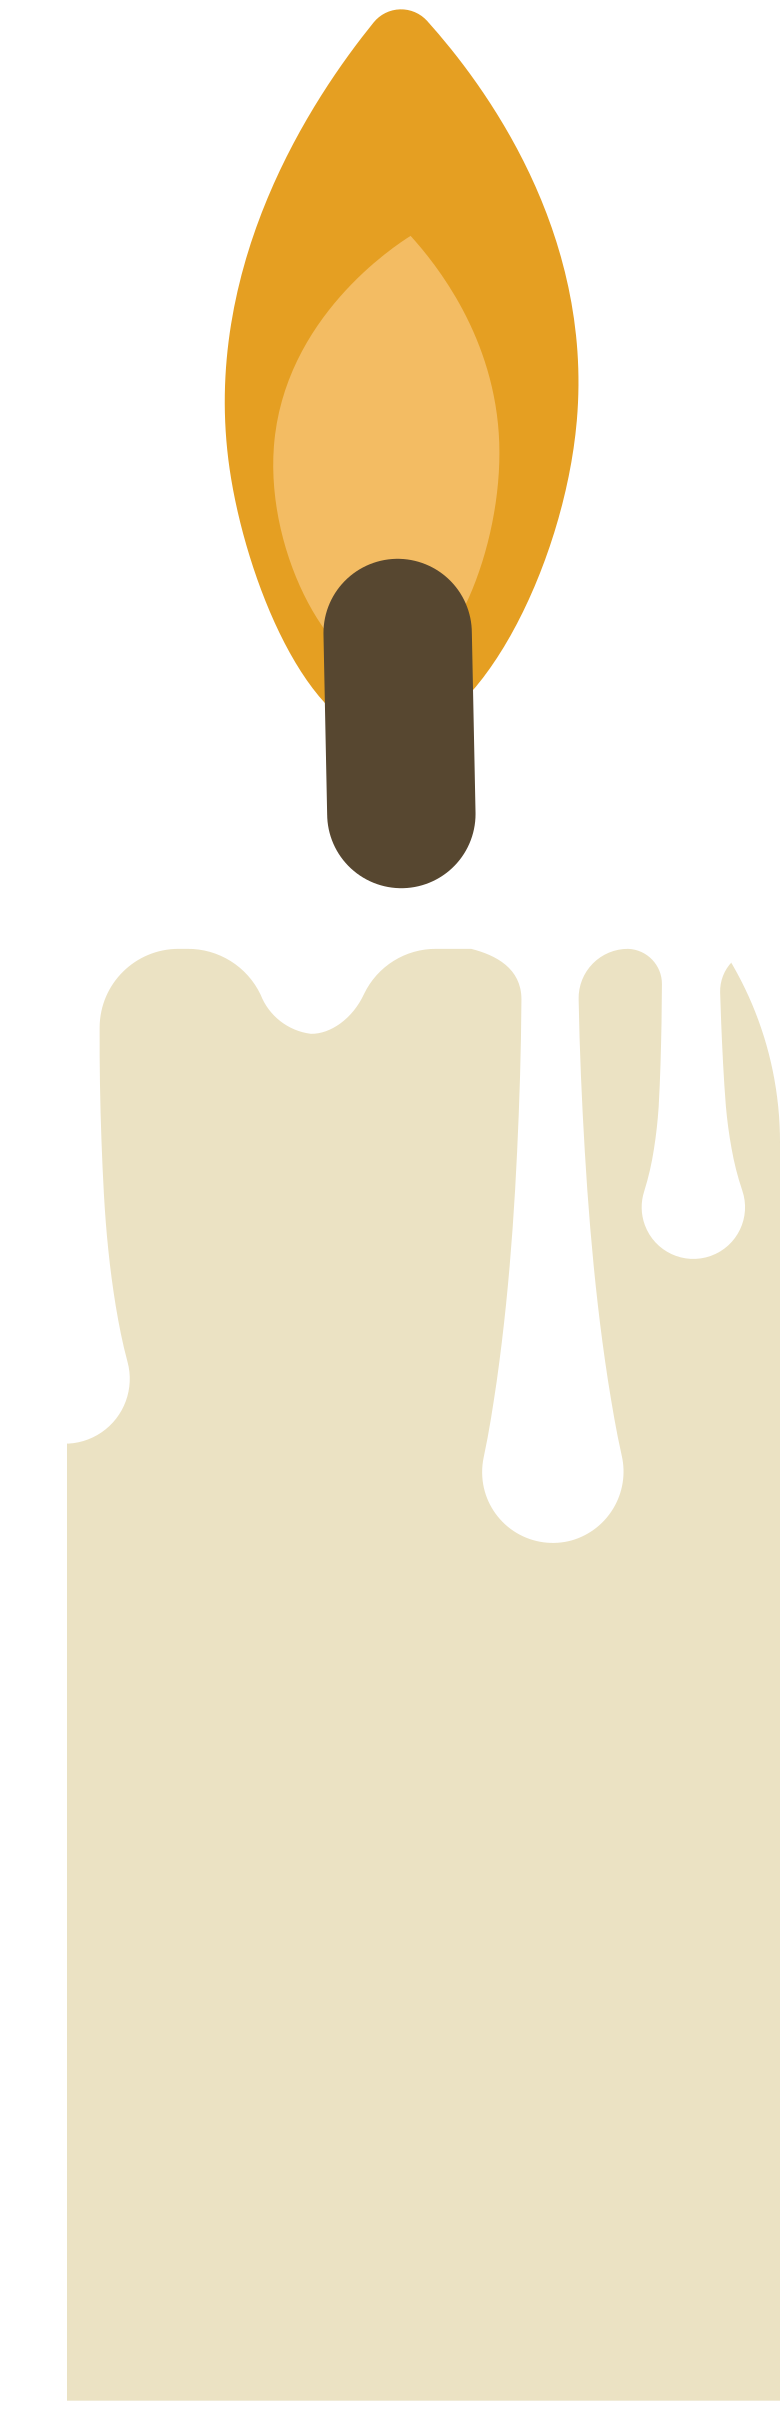 candle のPNG、SVGクリップアートイラスト